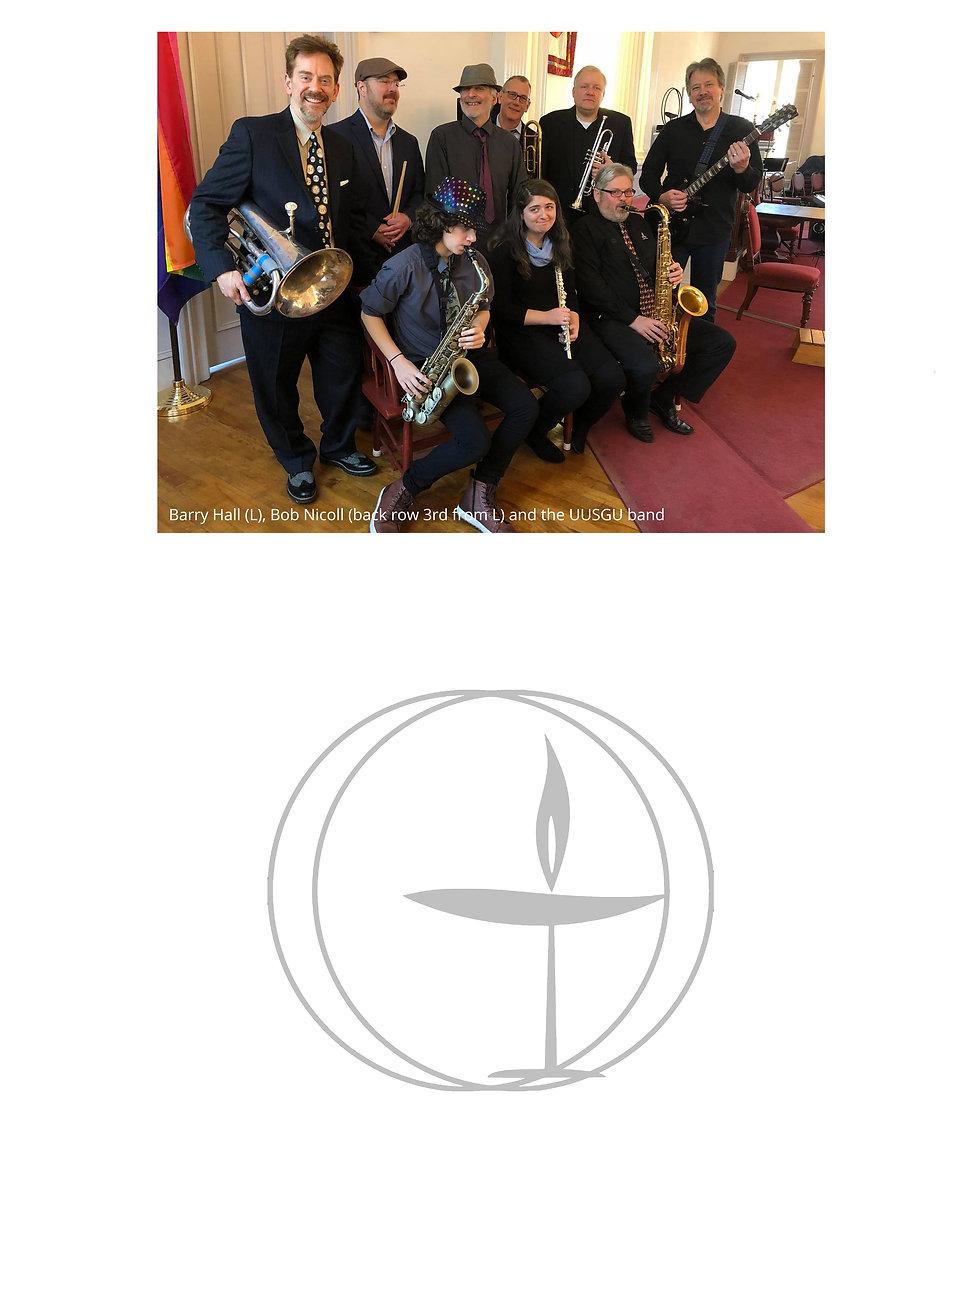 Musicians in black Strip Background Image 3Kx4K.jpg